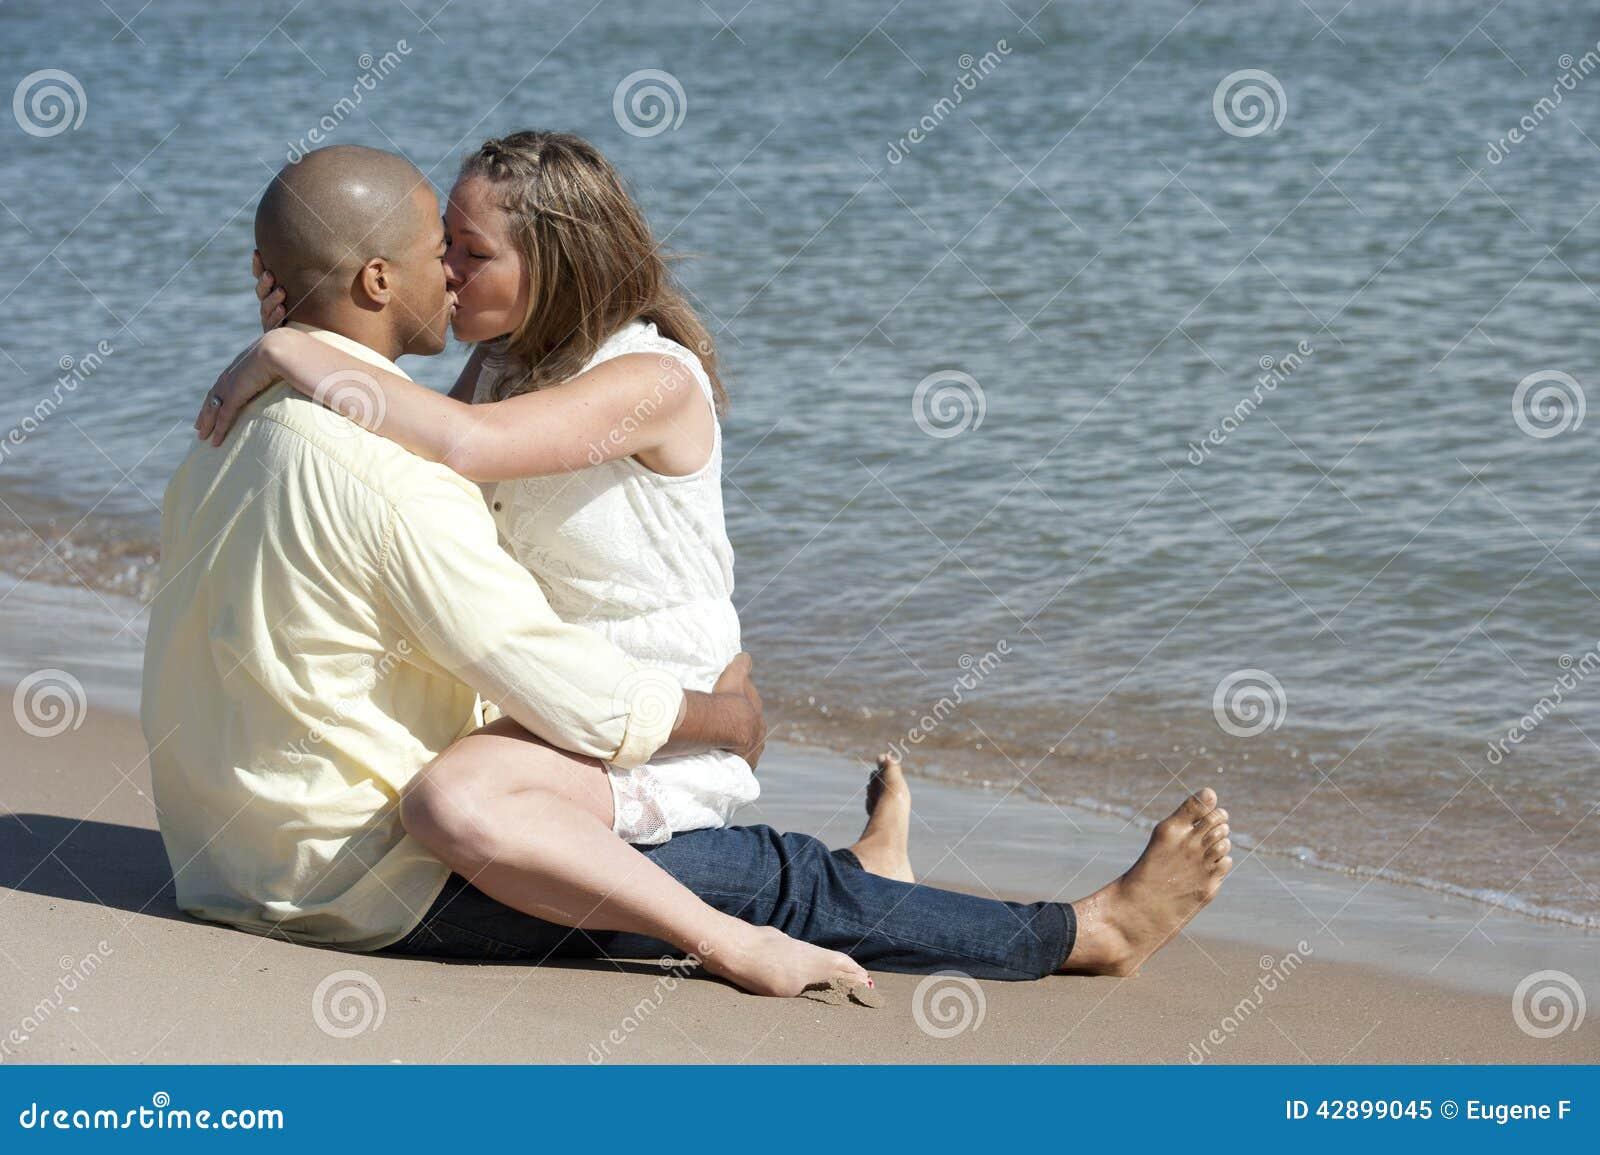 Romantic Interracial Cards 33